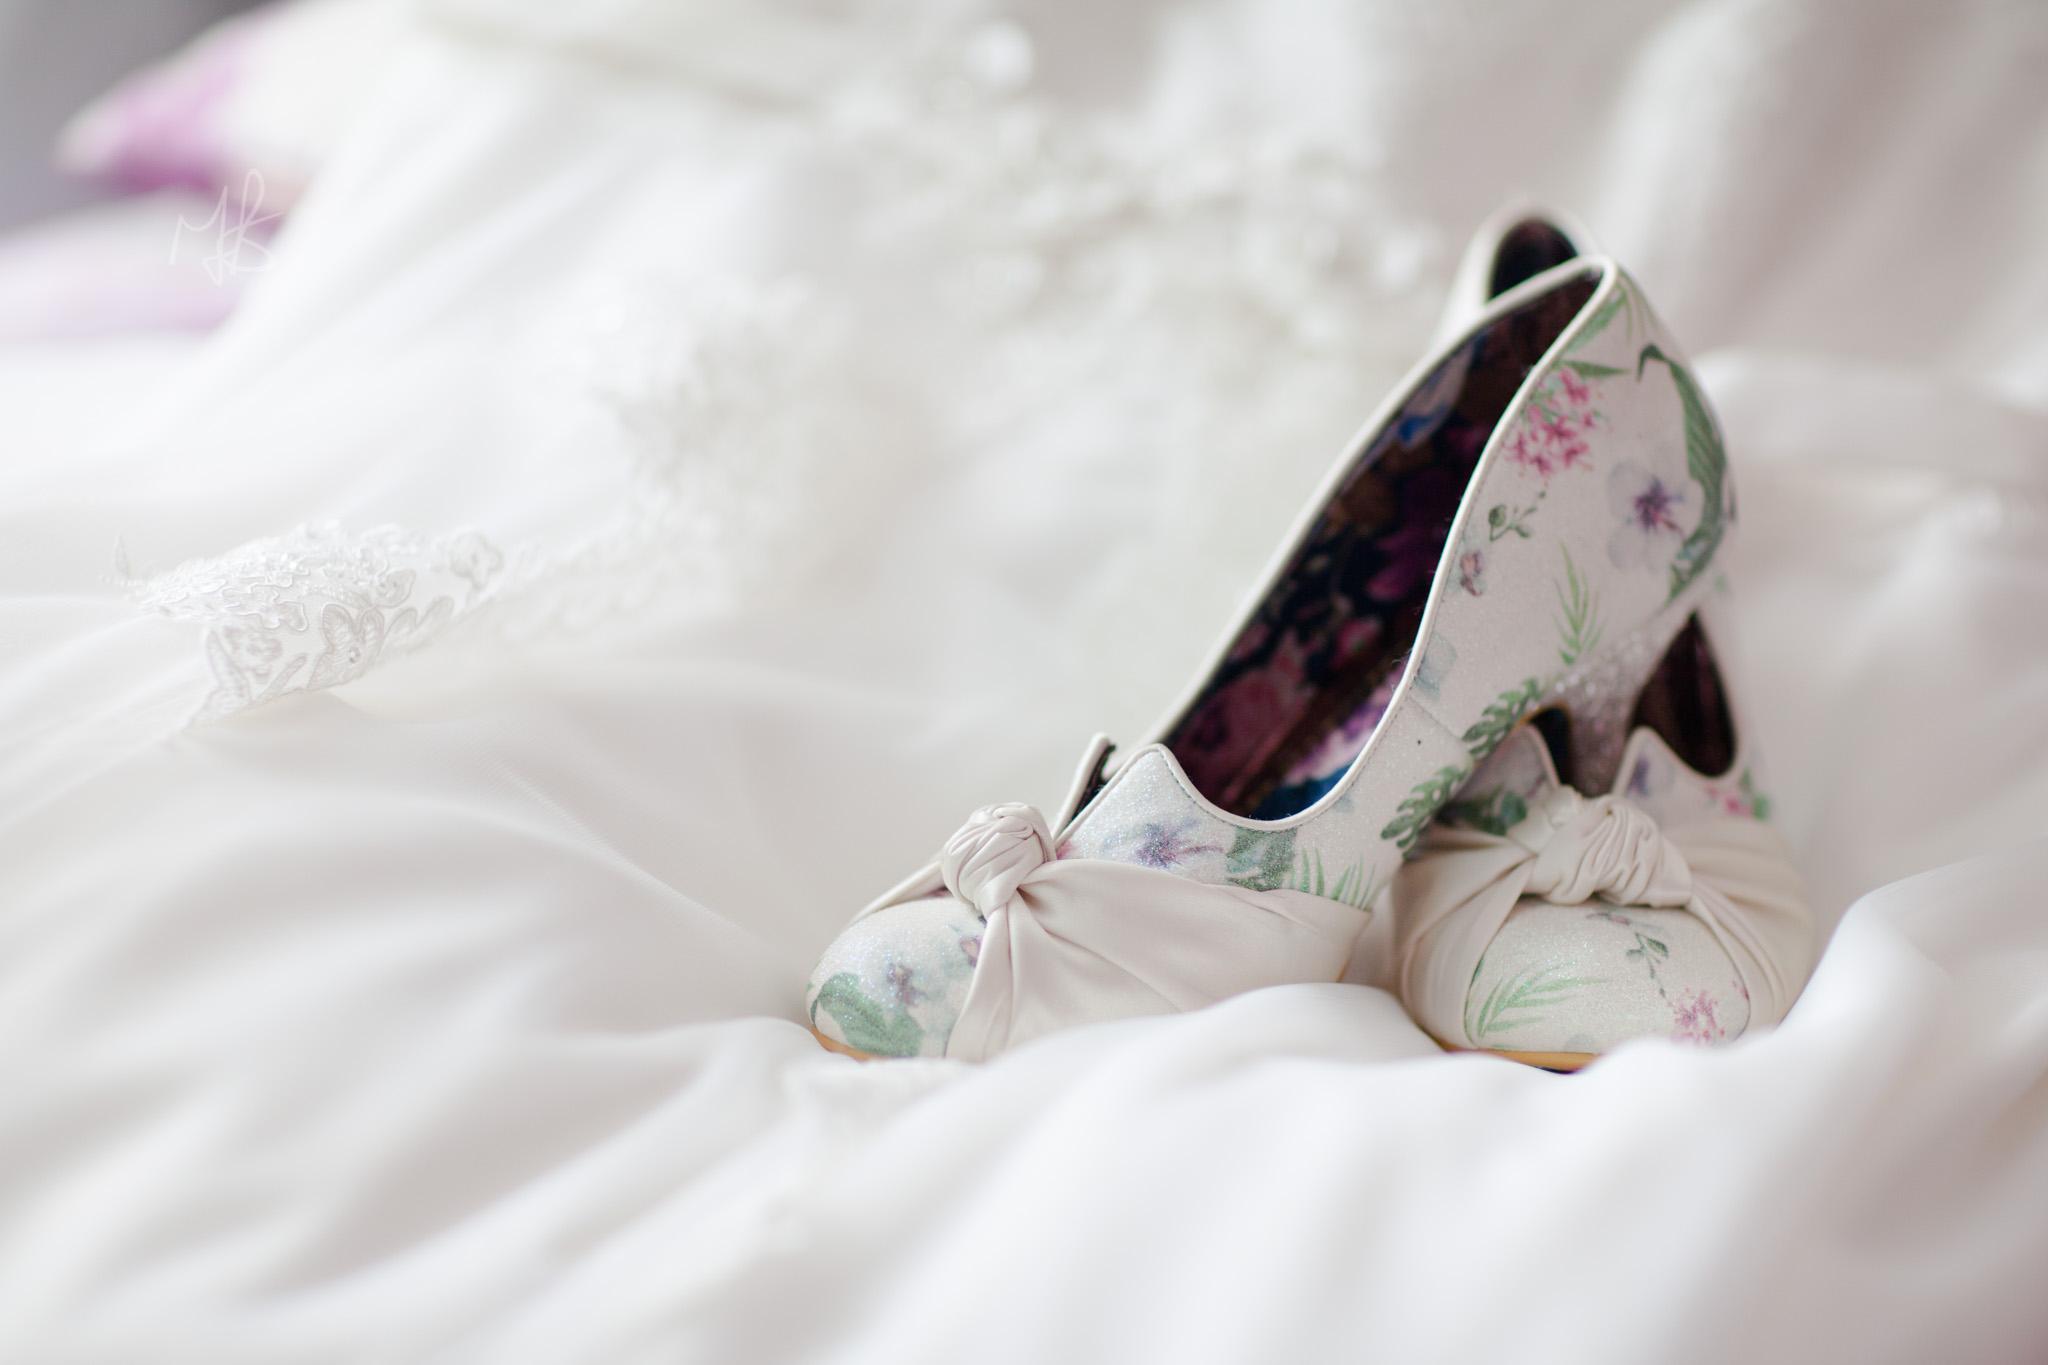 Northern-Ireland-Wedding-Photographer-Mark-Barnes-Ballymena_wedding-photography-Leighinmohr-House-Seamas_Alanna_For-web-7.jpg